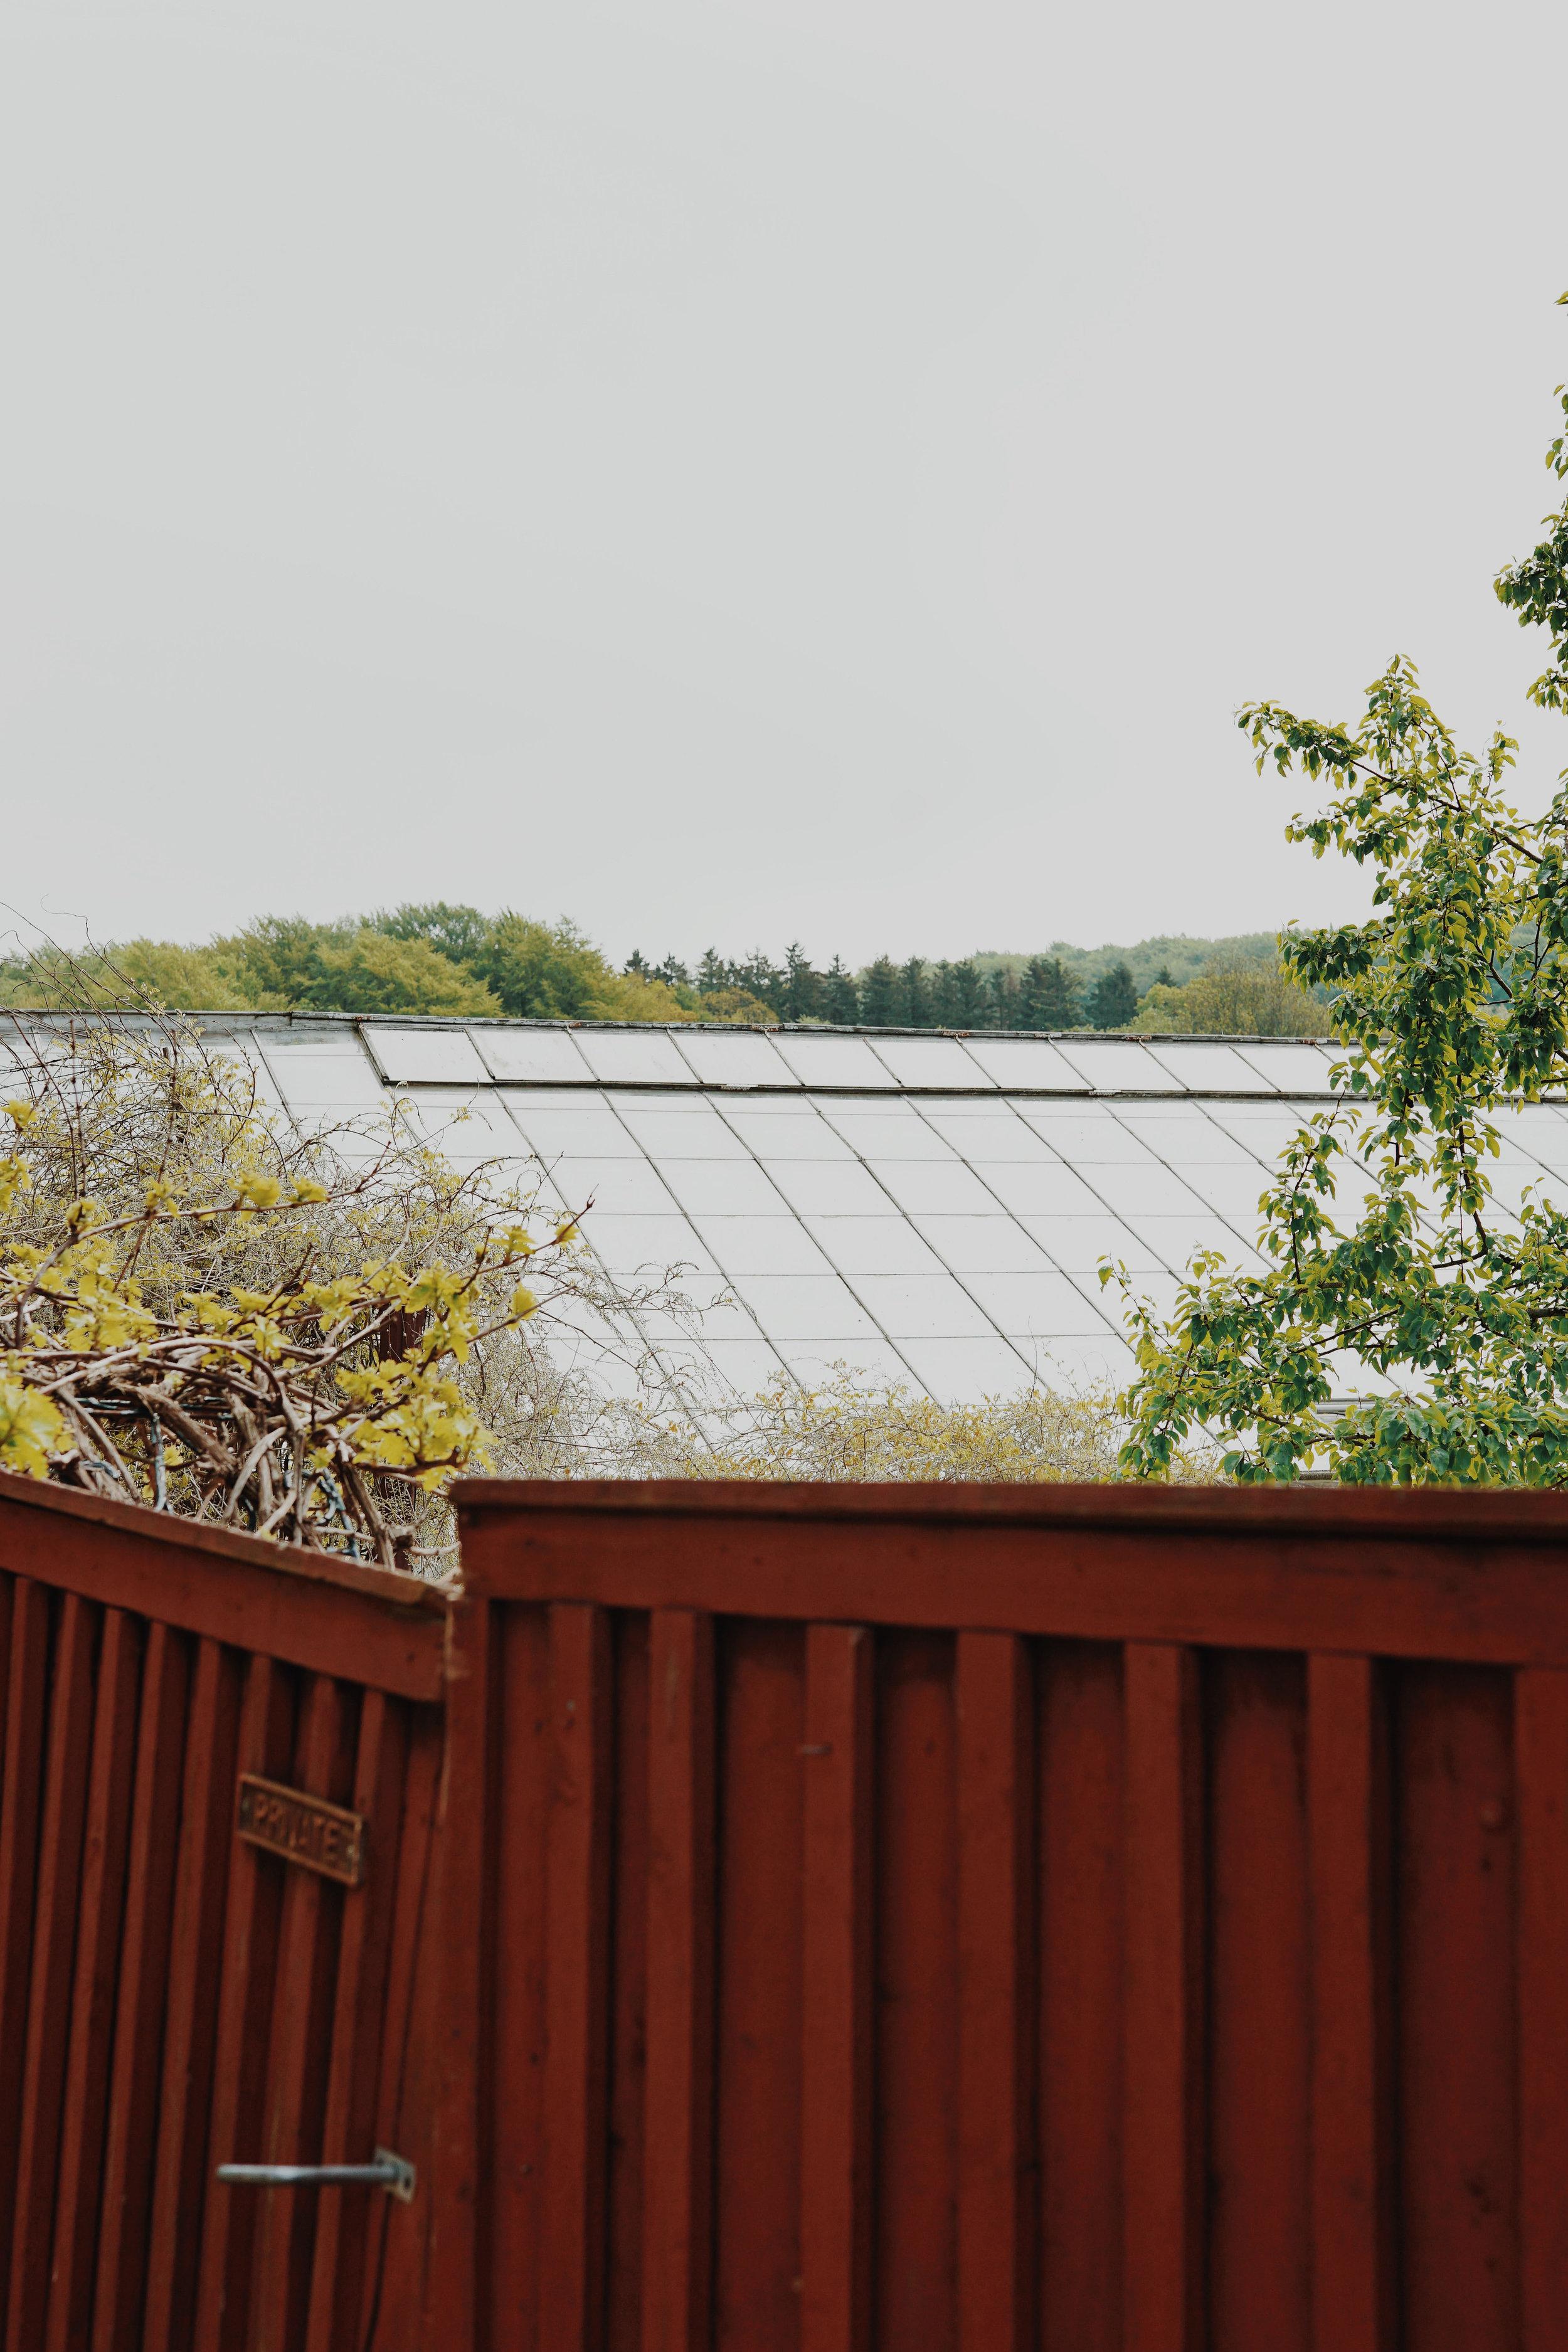 ASROSENVINGE_VisitSkane_Sweden_Backdalens_Handelstradgard_Greenhouse_Orangerie_LowRes-154.jpg